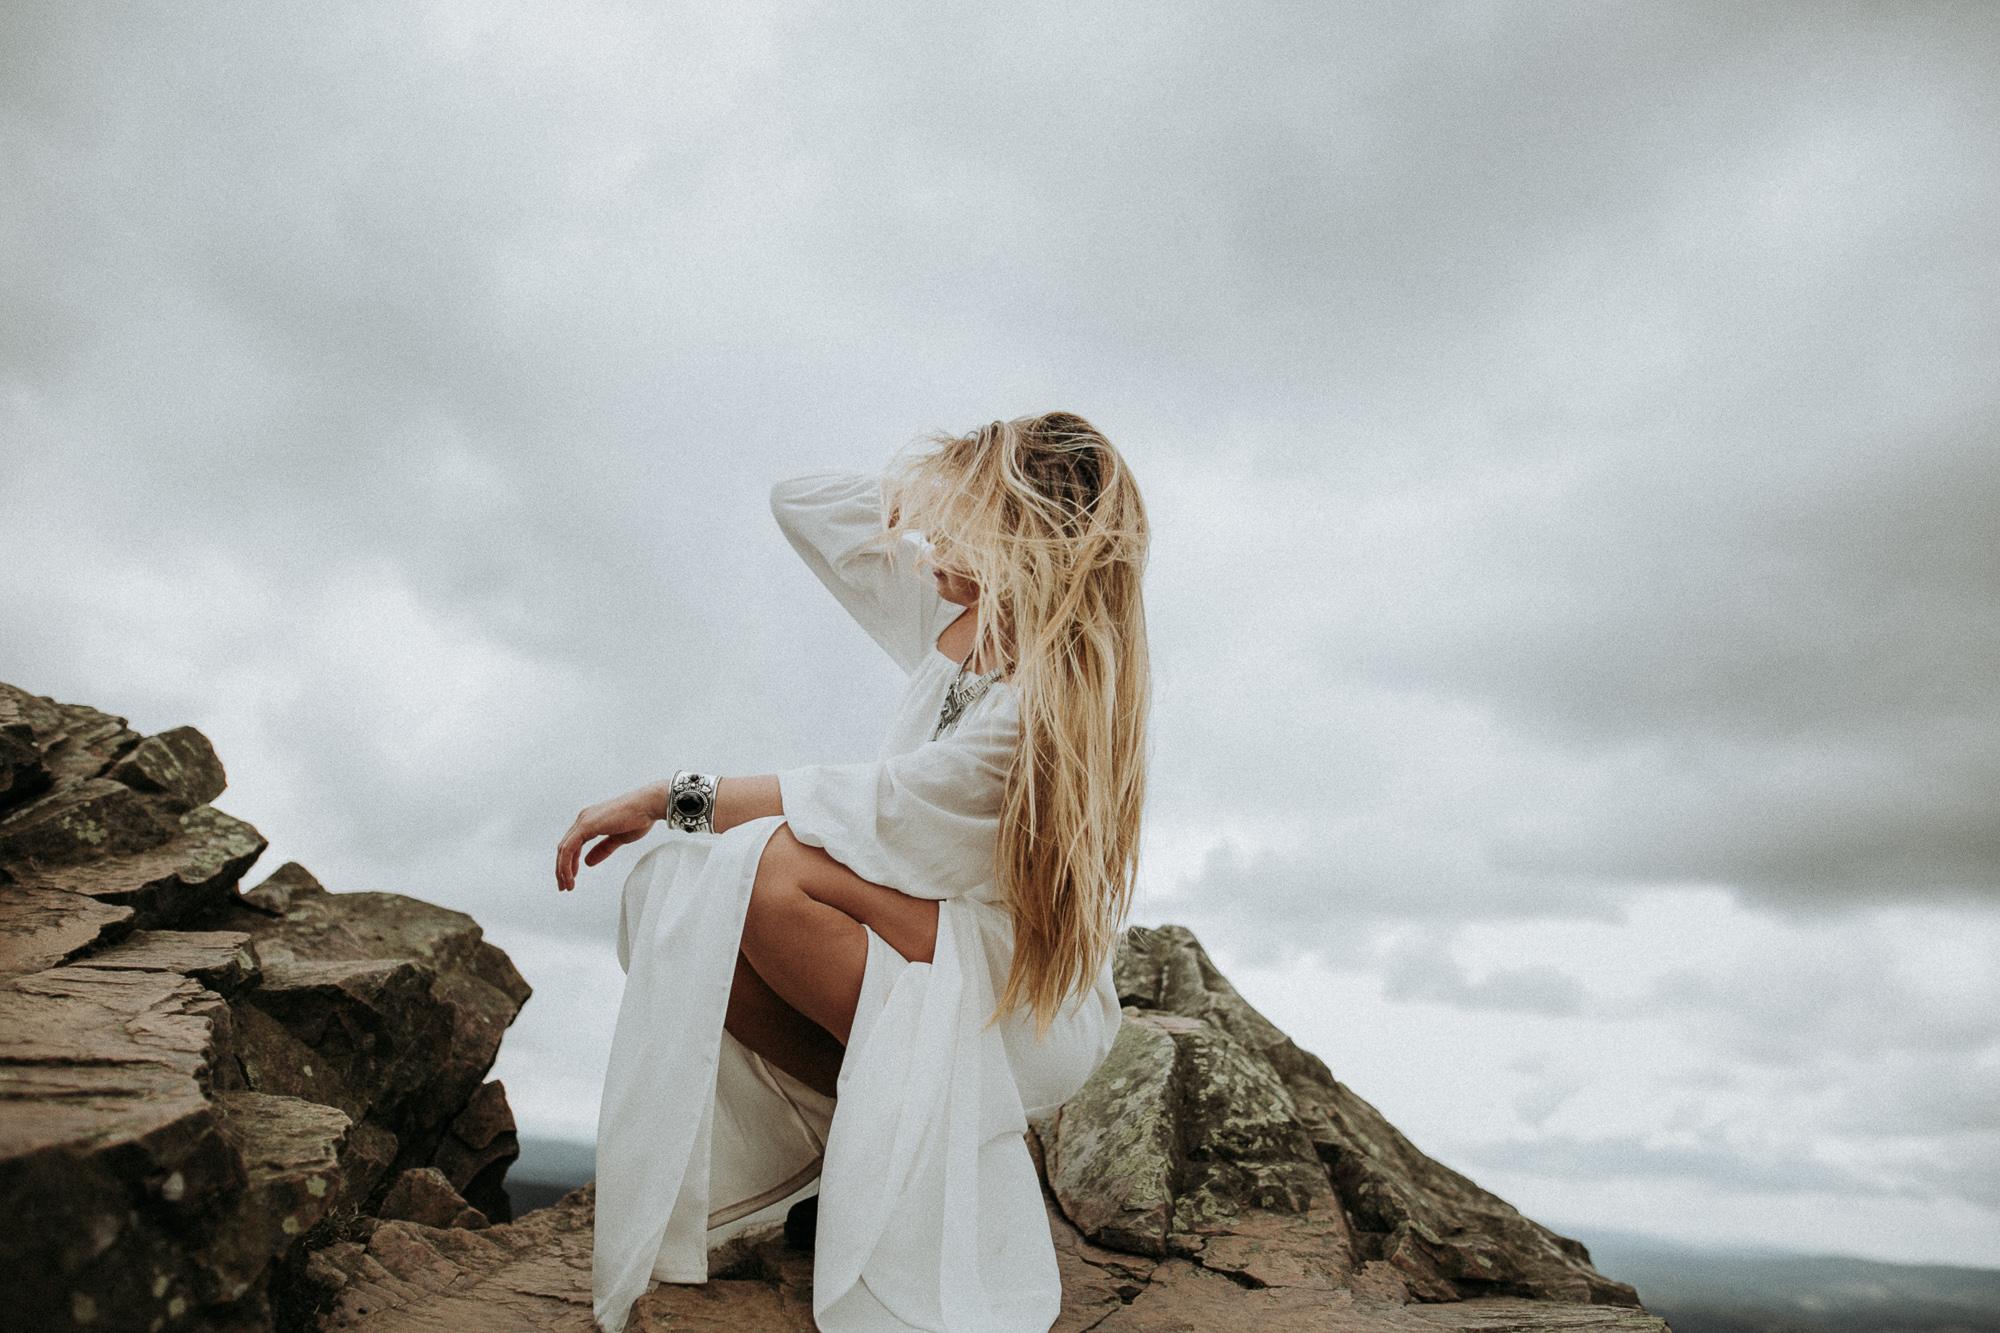 intothewild_julia_dimi_38